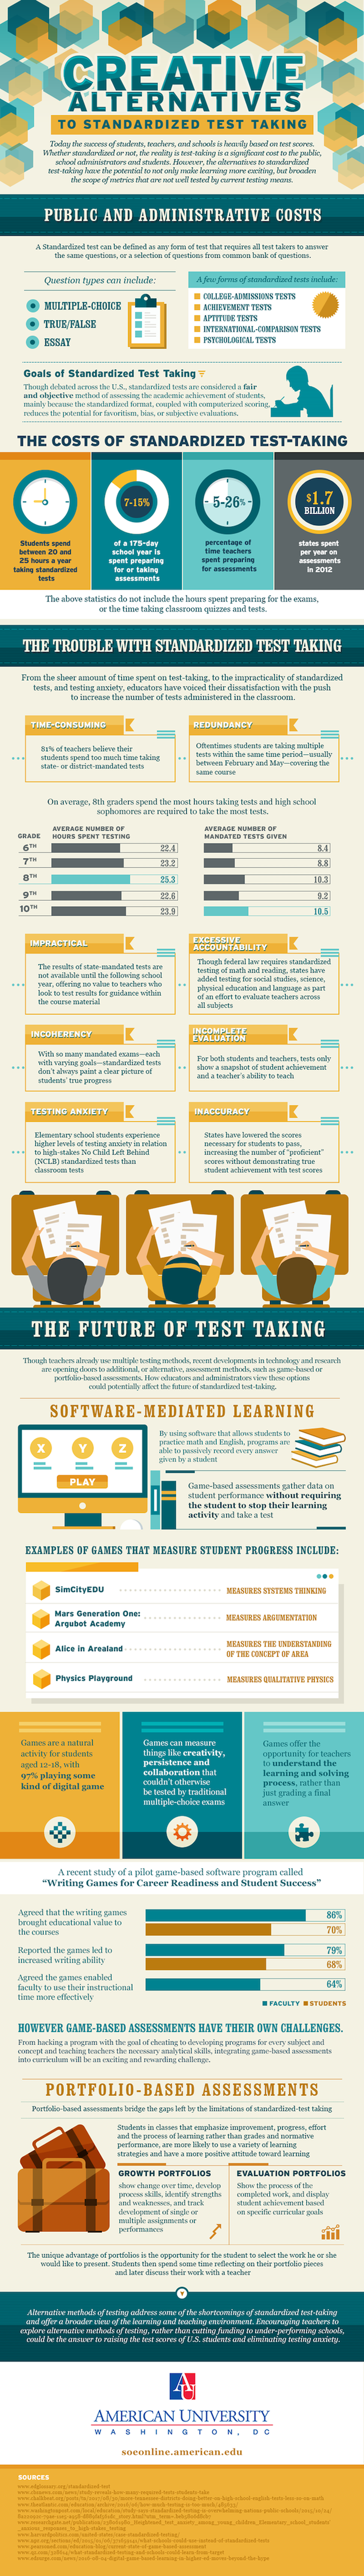 Creative Alternatives to Standardized Test Taking infographic